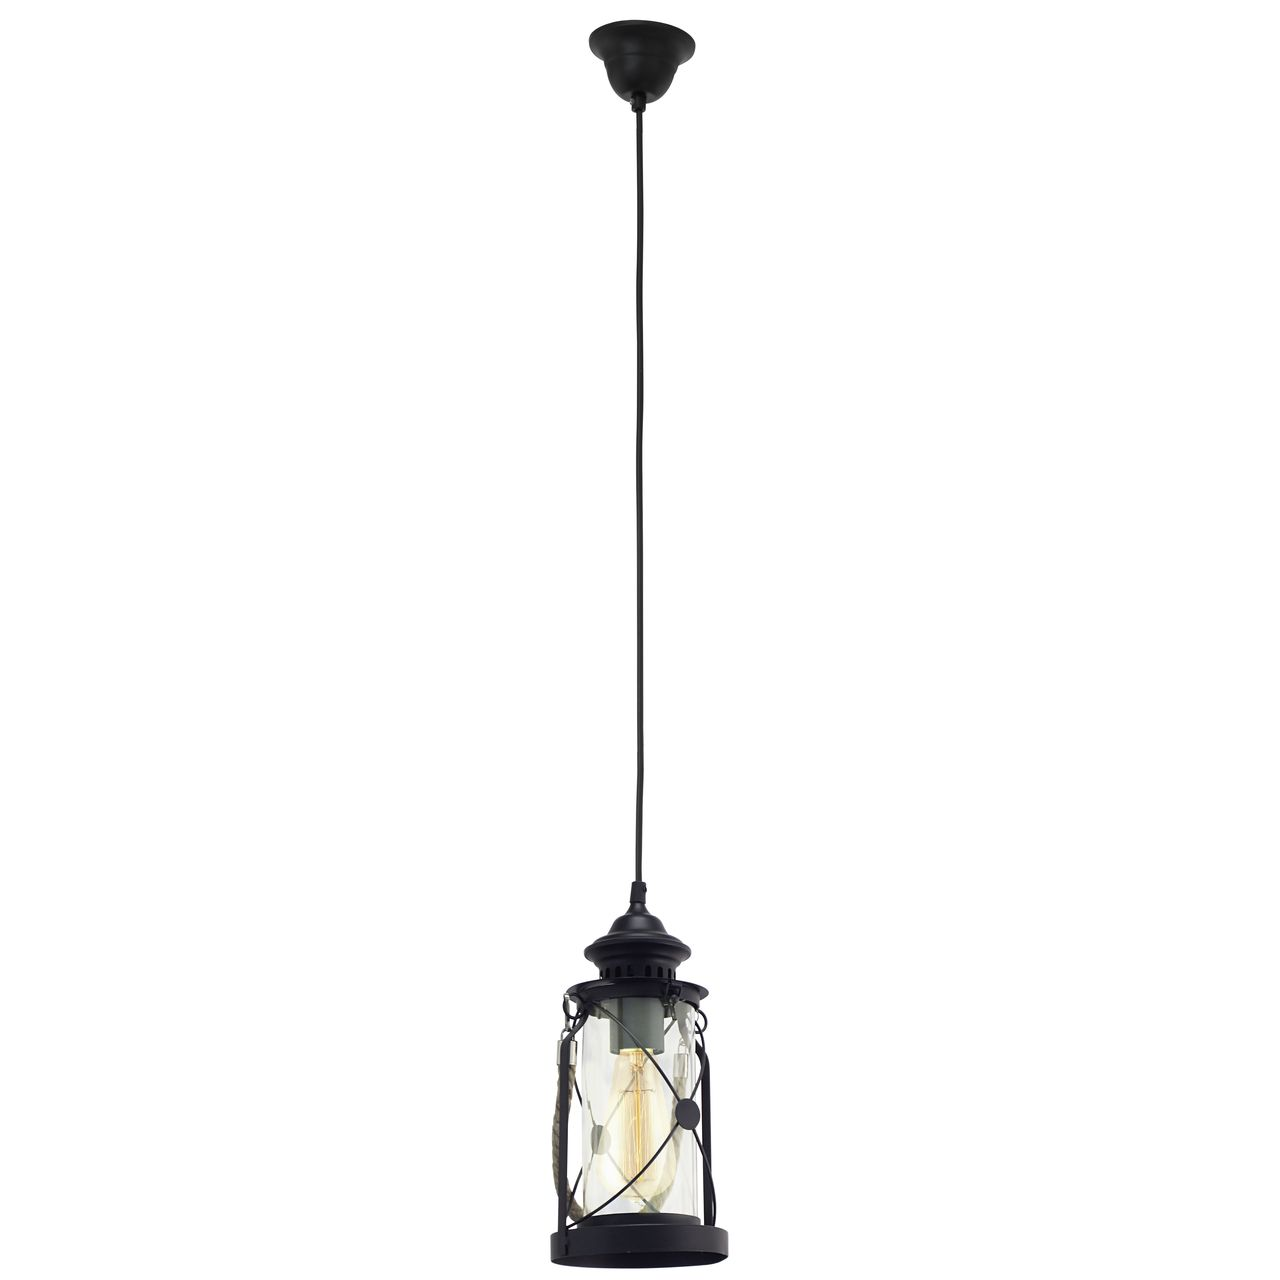 Подвесной светильник Eglo Vintage 49213 абажур eglo vintage 49659